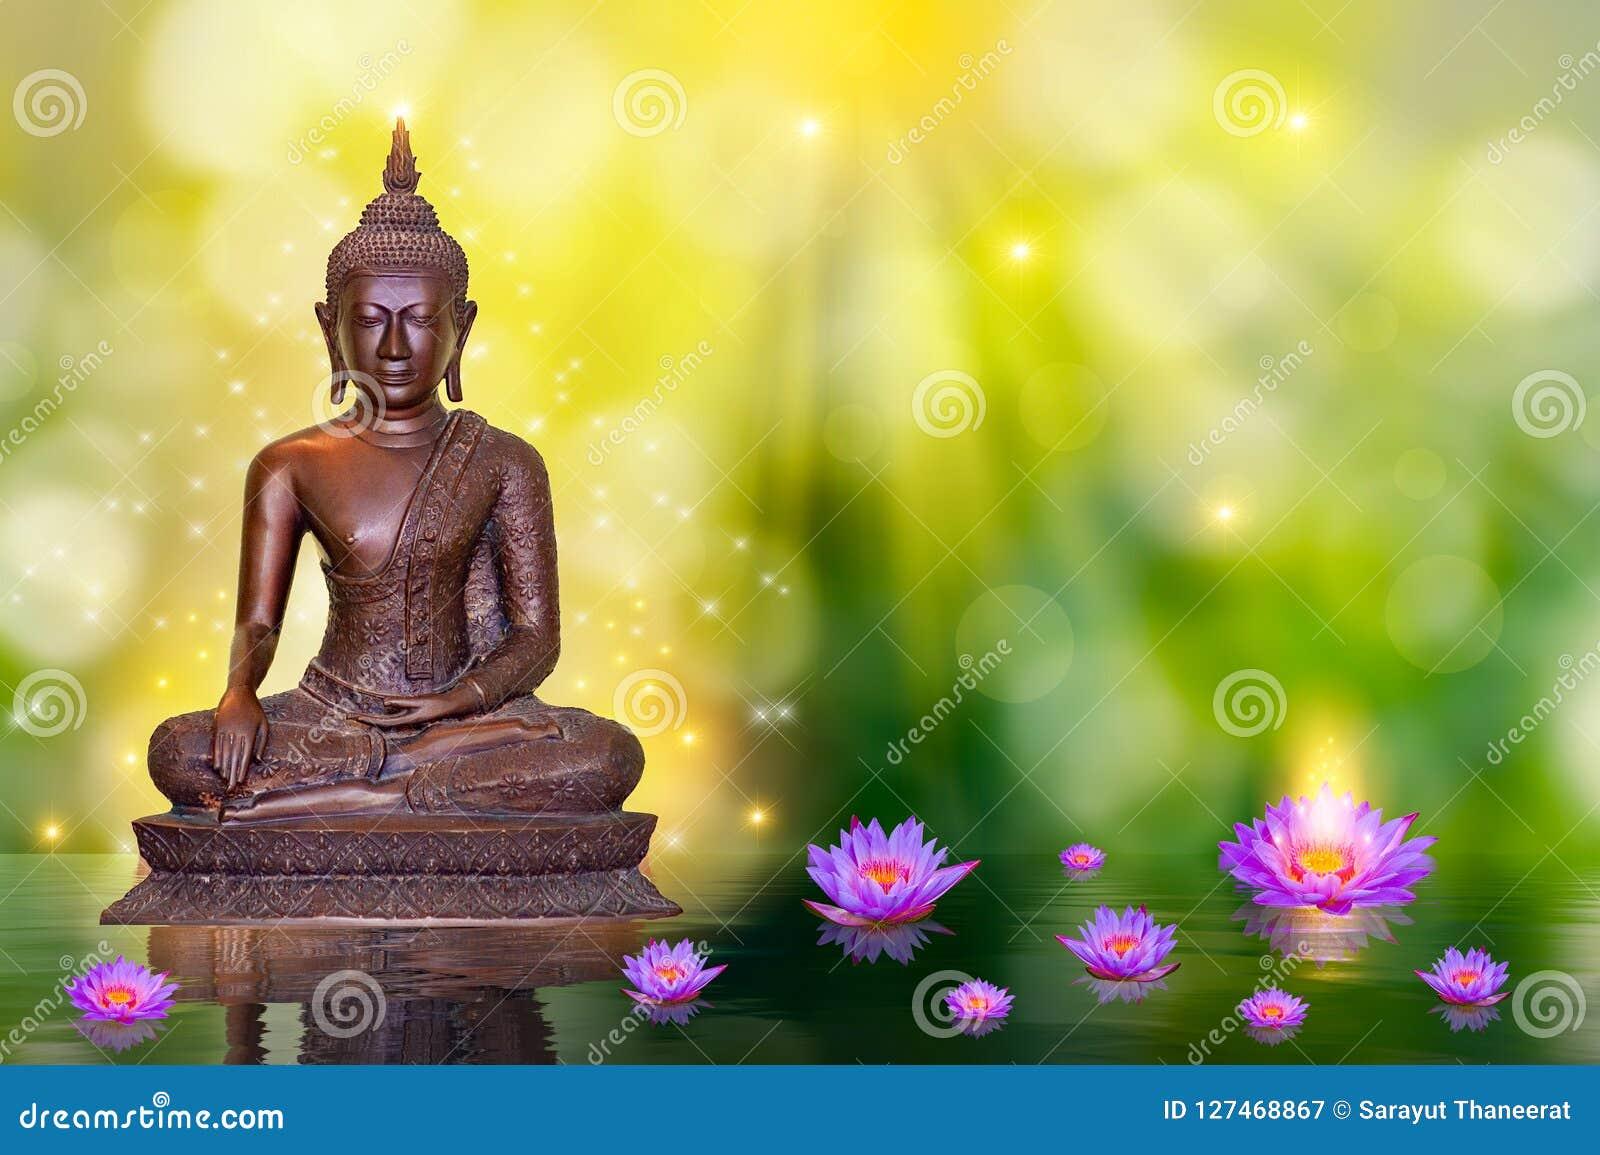 Buddha Statue Water Lotus Buddha Standing On Lotus Flower On Orange